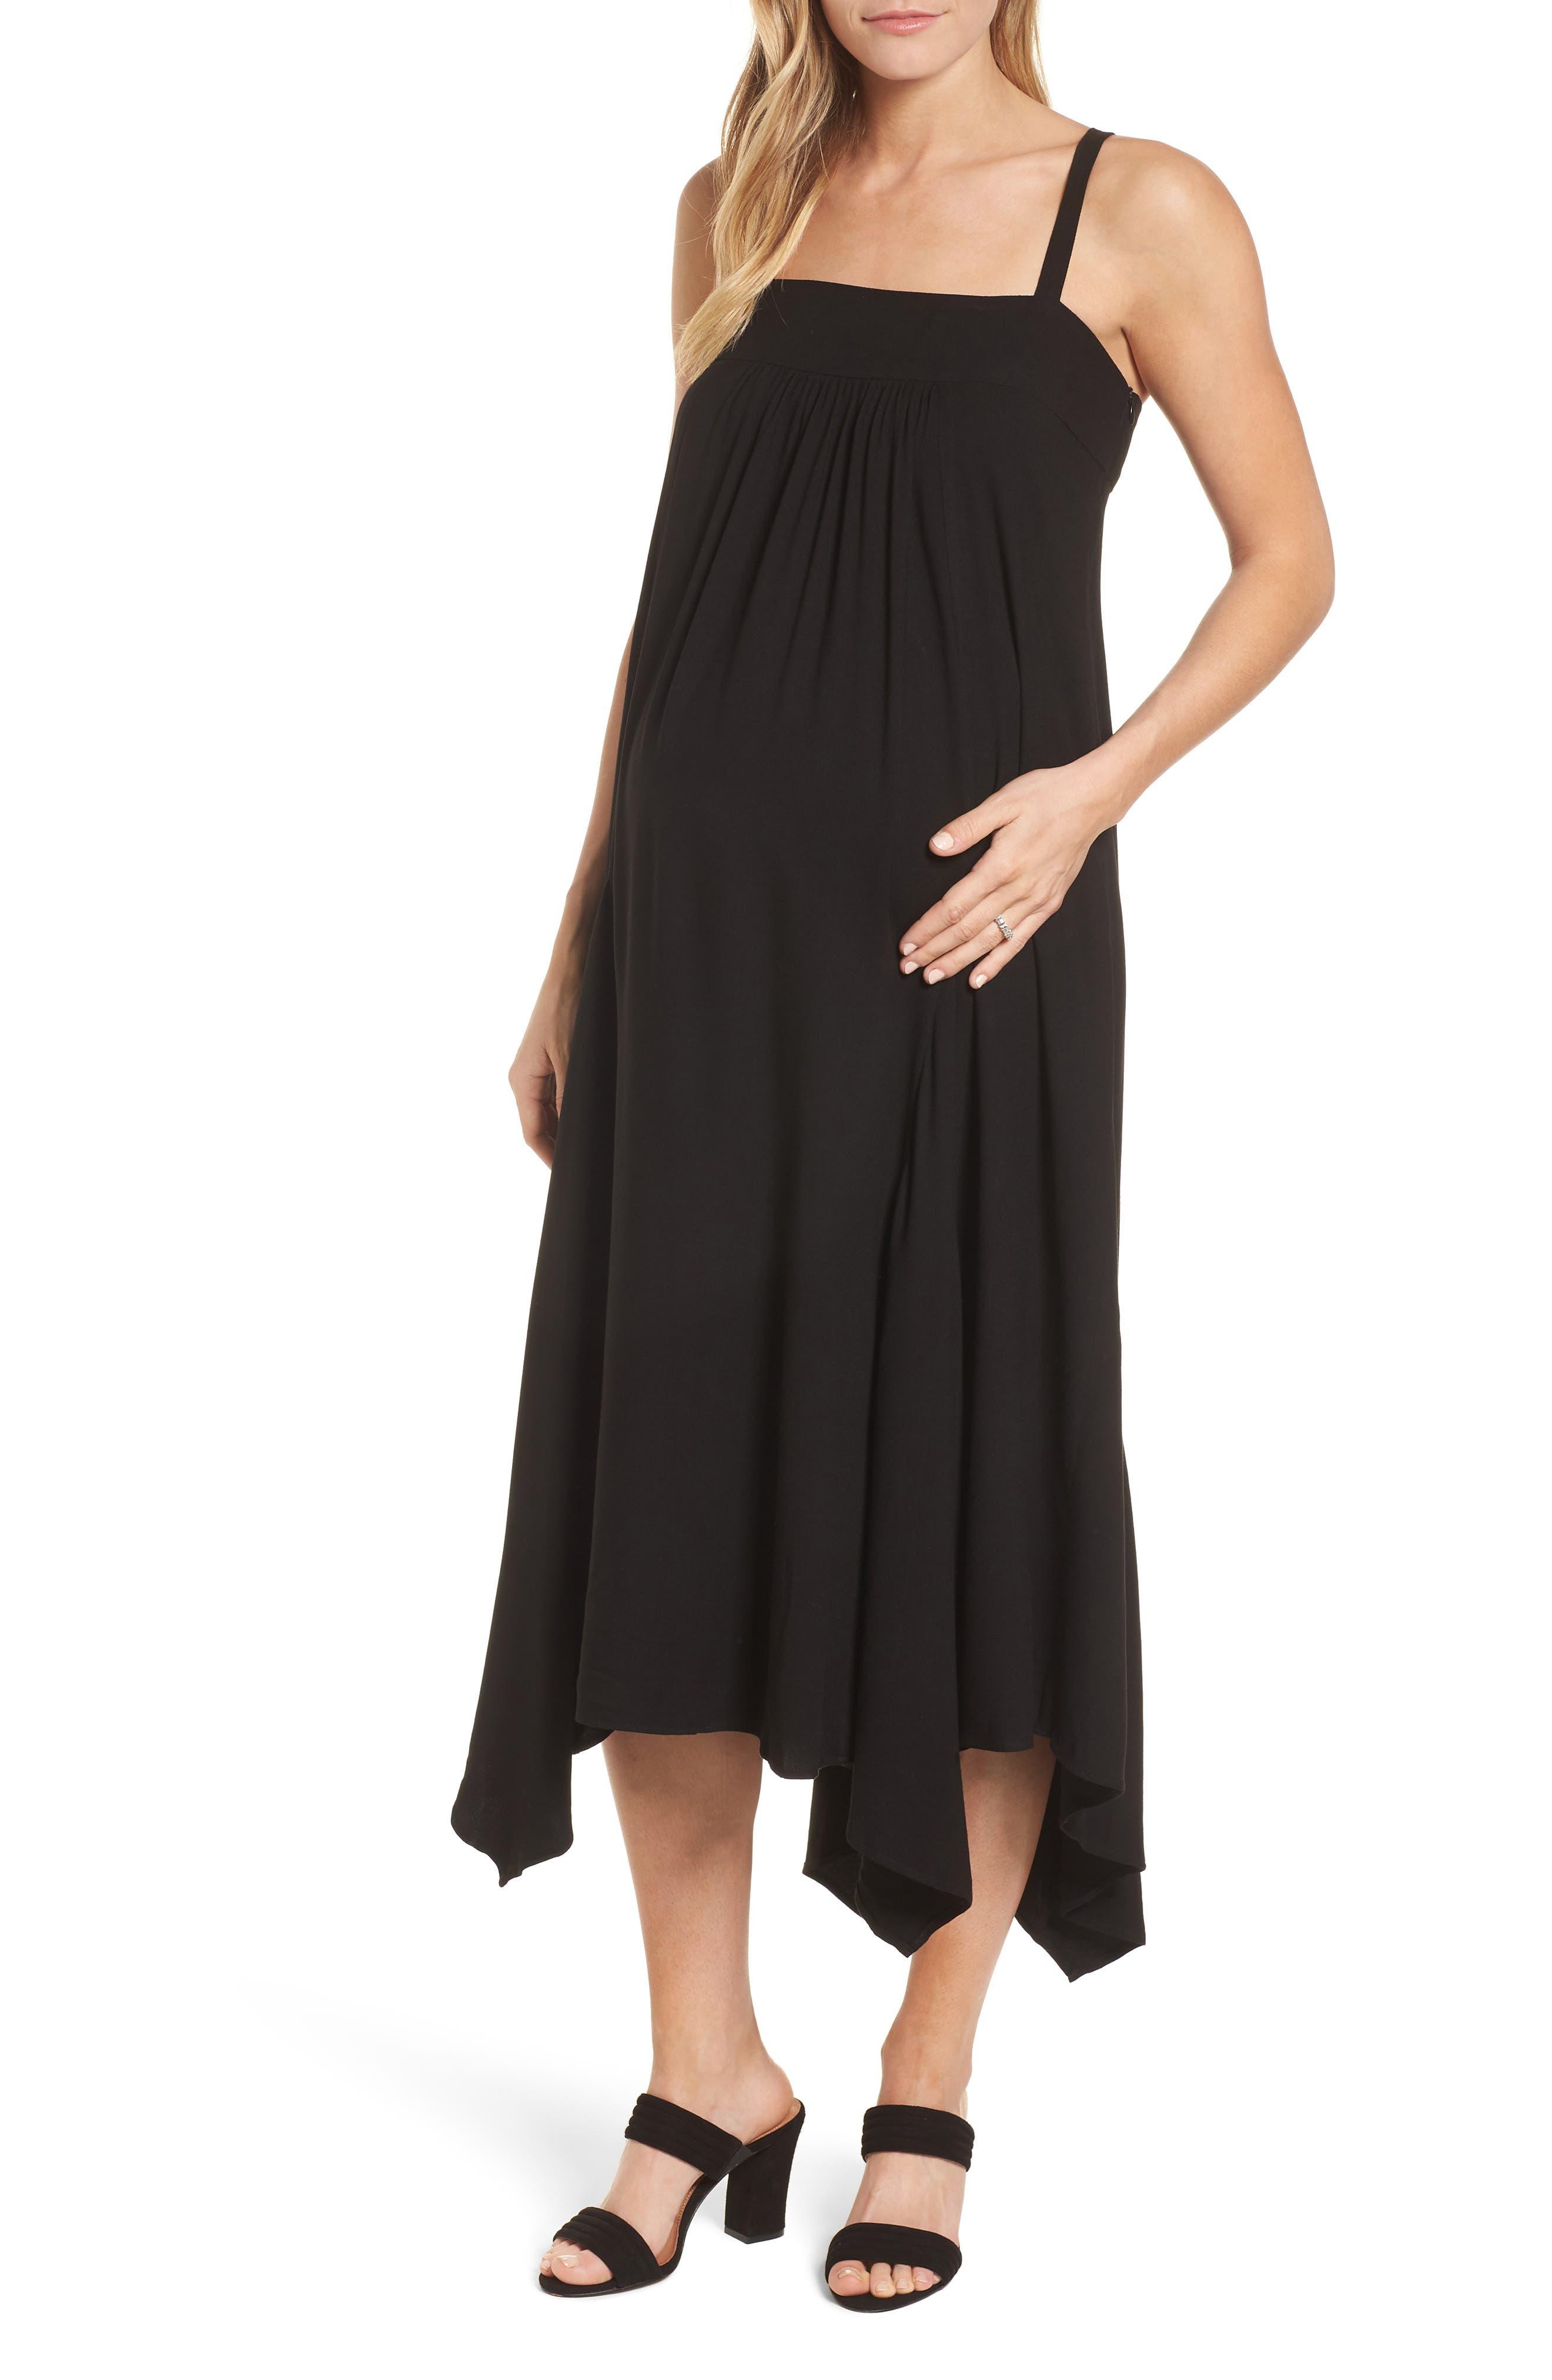 Isabella Oliver Carey Handkerchief Hem Maternity Dress